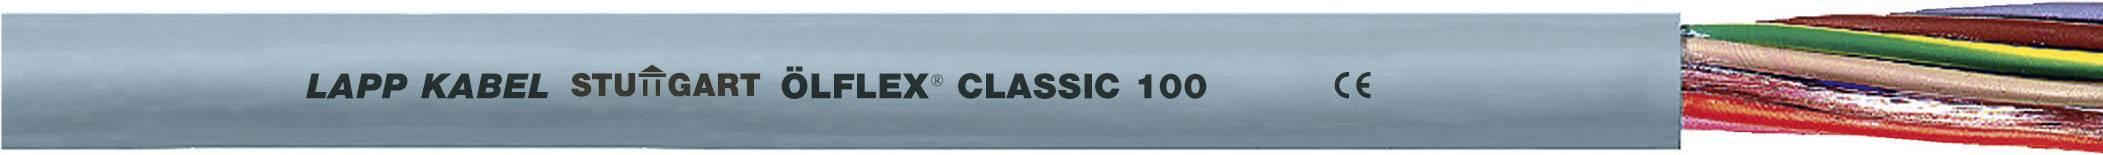 Kabel LappKabel Ölflex CLASSIC 100 4G16 (00101123), PVC, 20,4 mm, 750 V, šedá, 1000 m